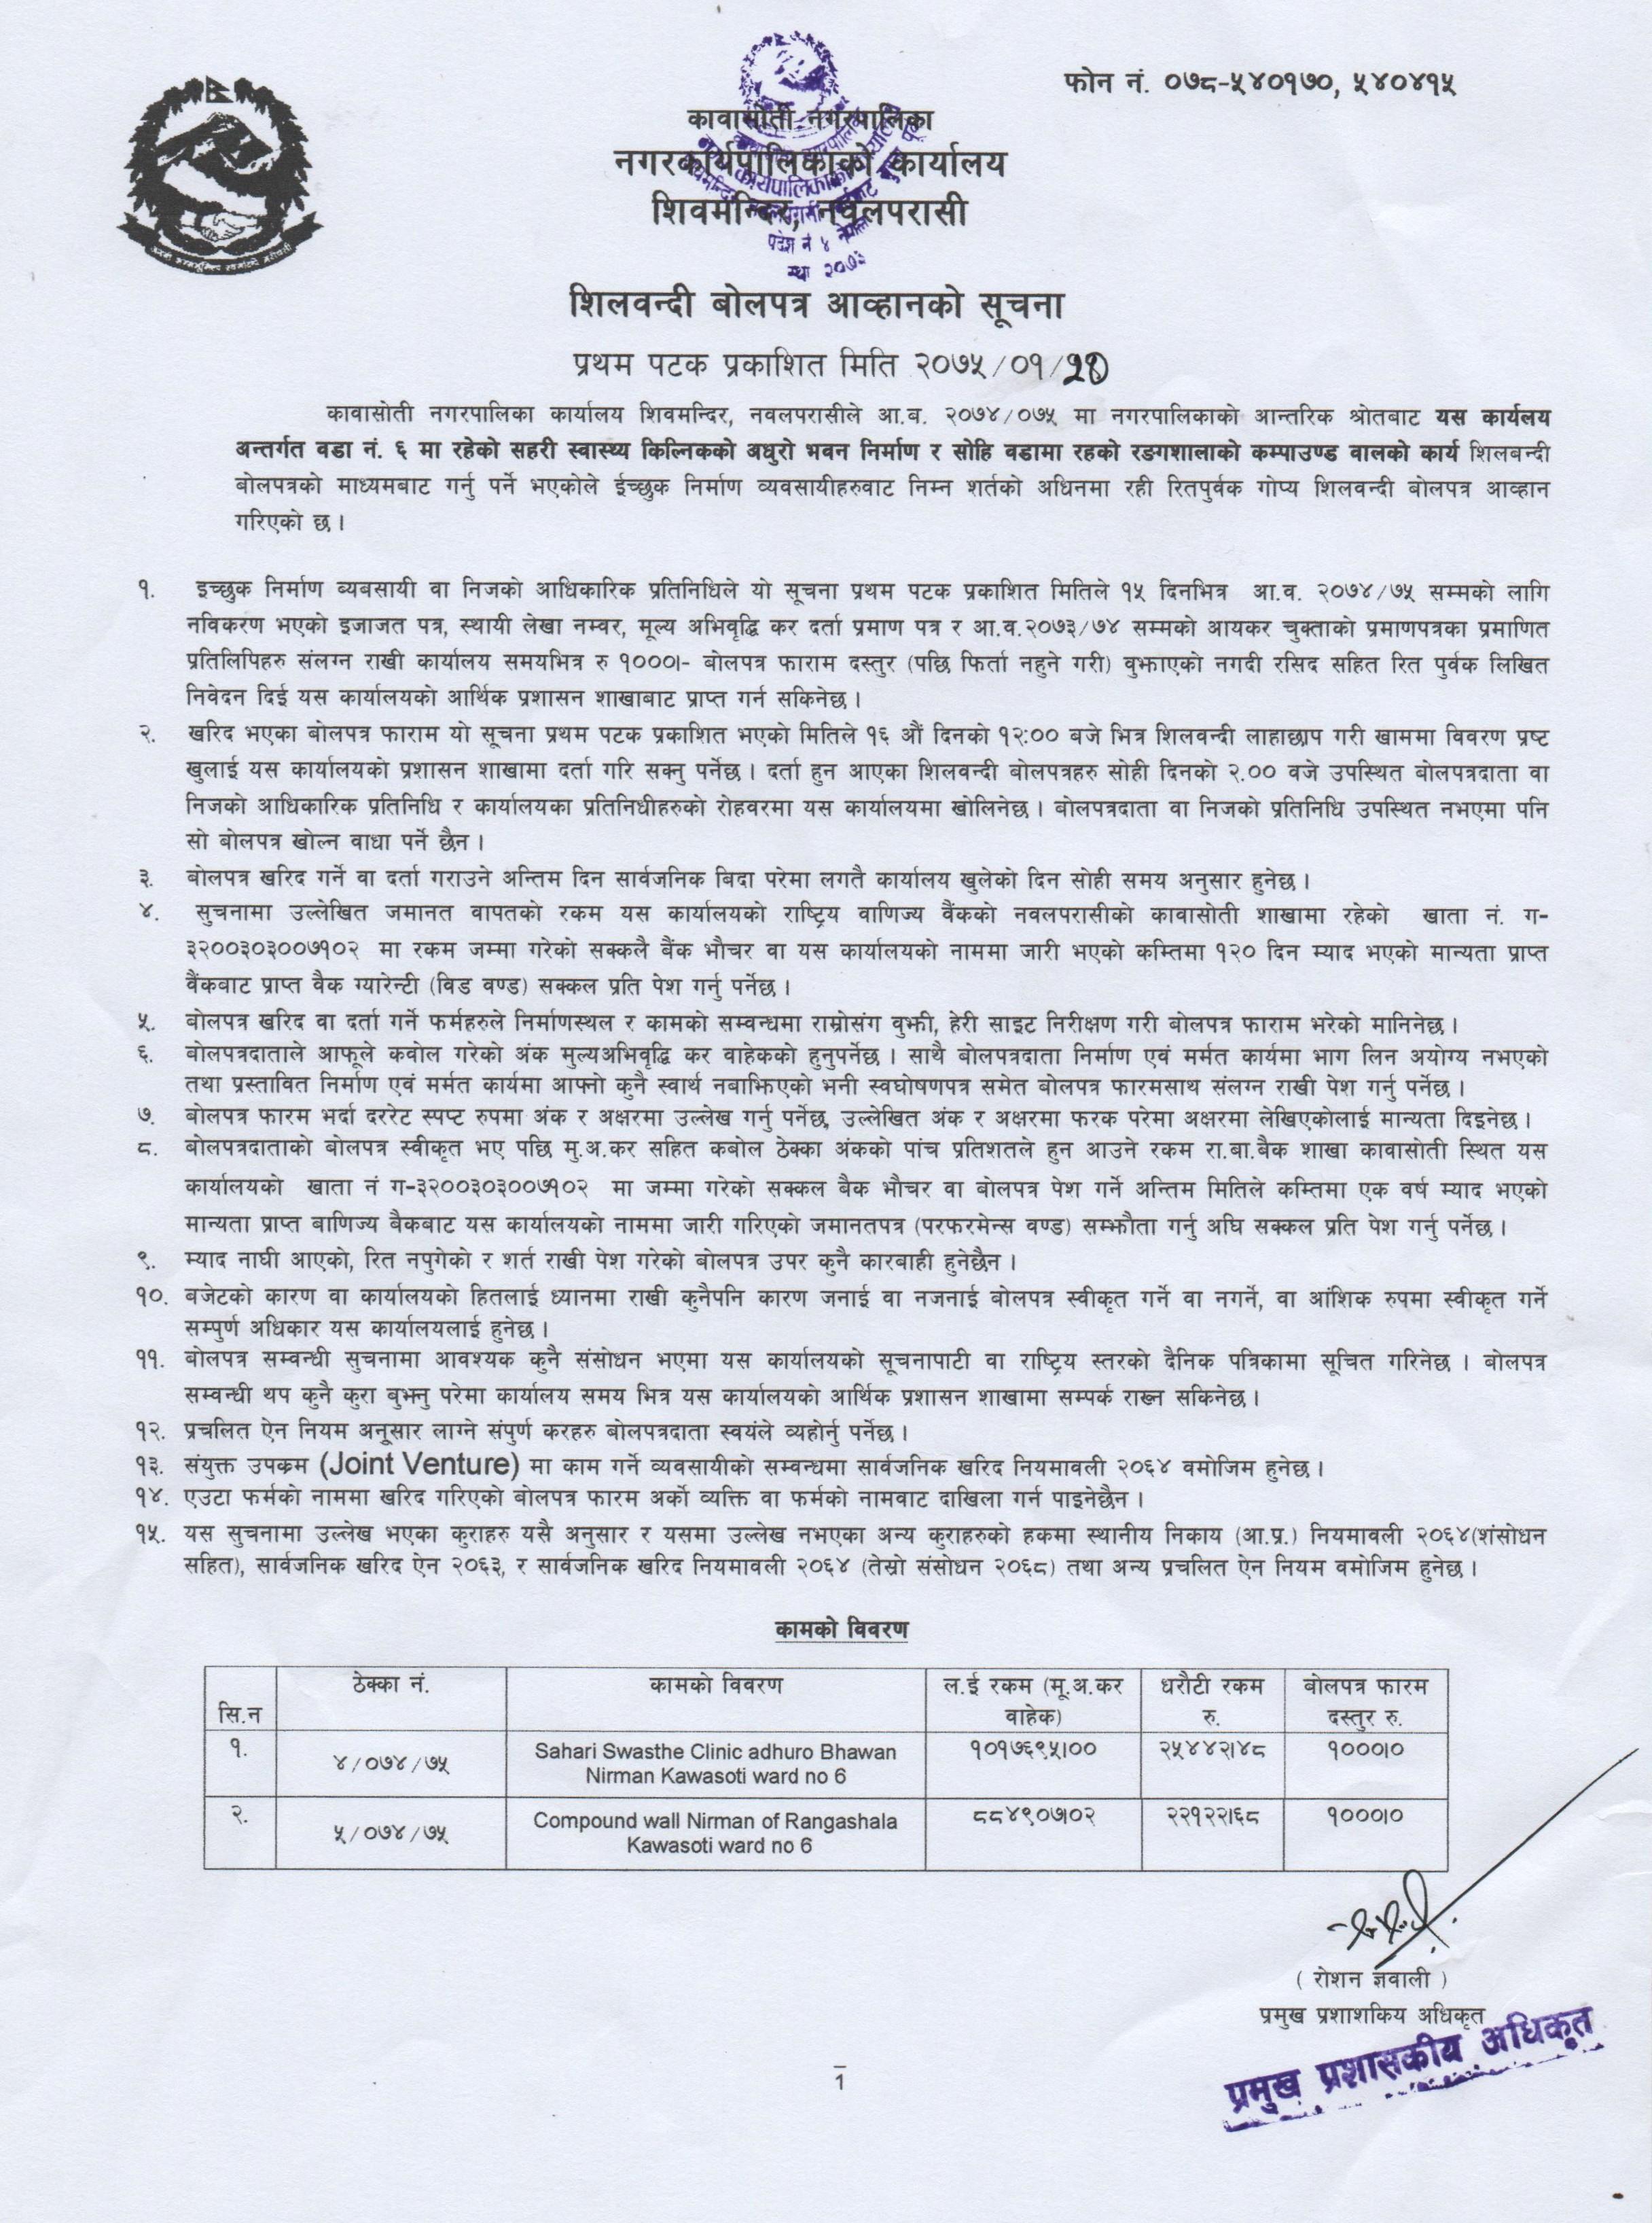 Information on Shillbandi Bidding Request